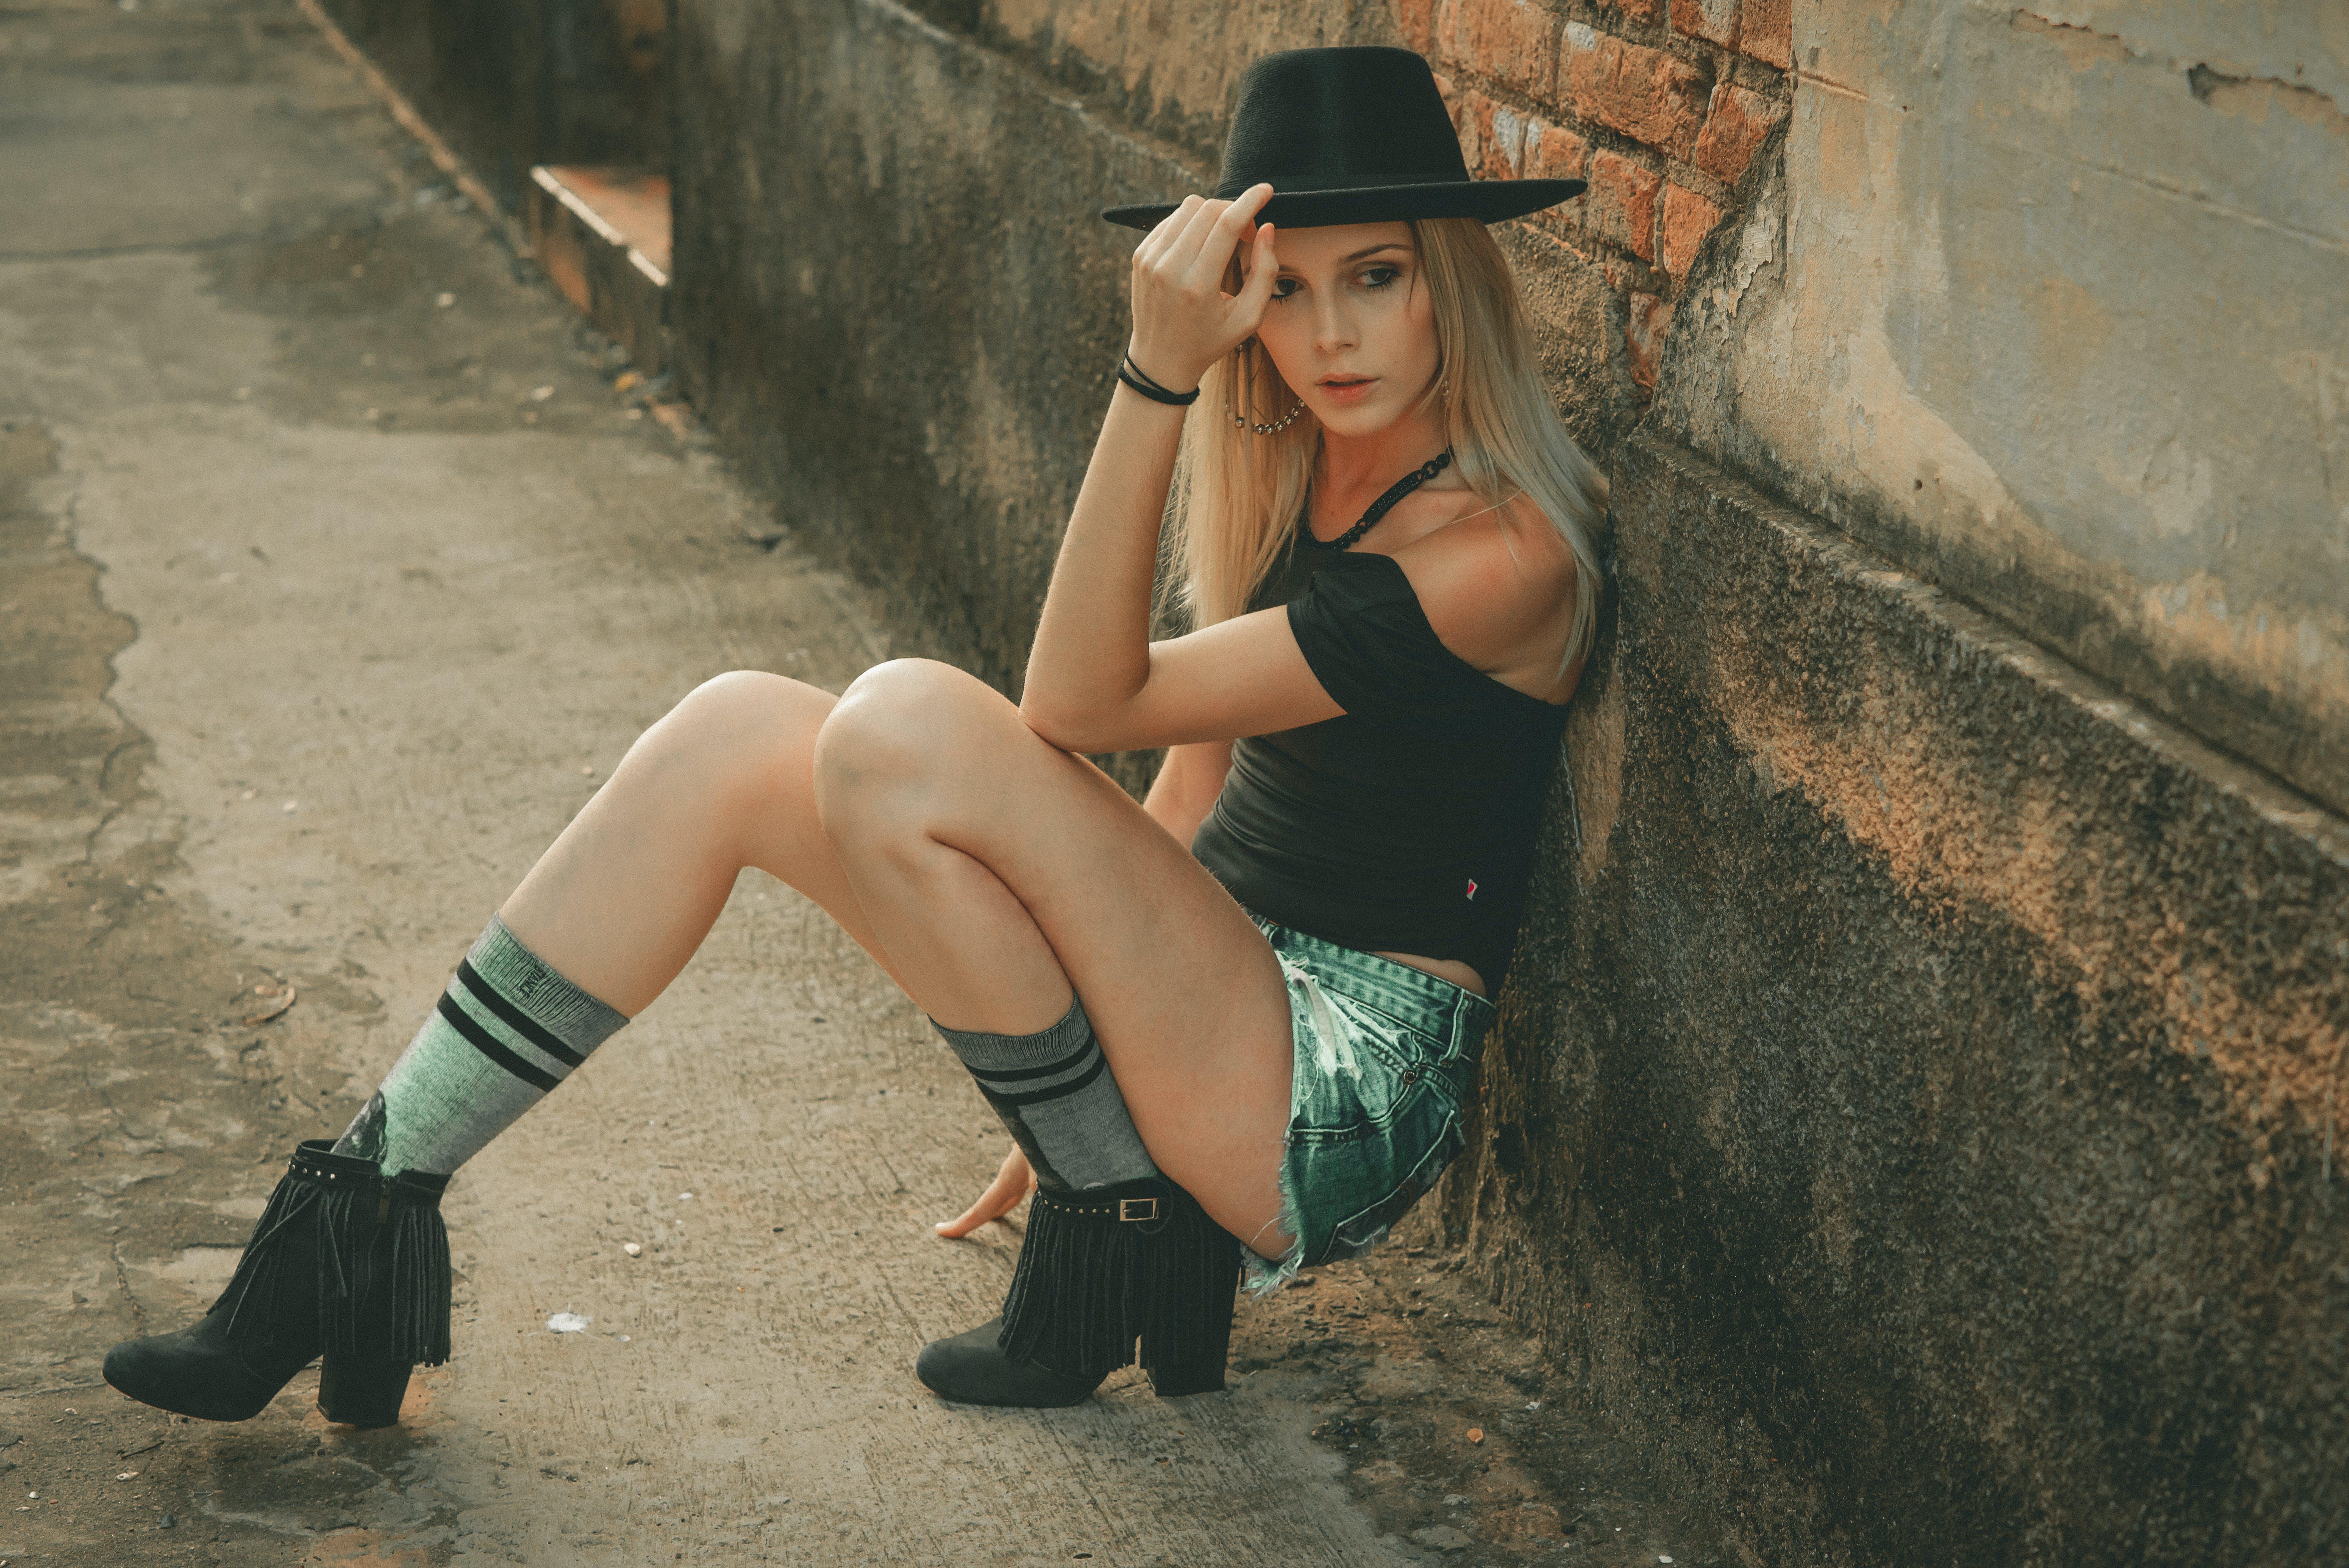 Free stock photo of #girl, #urban